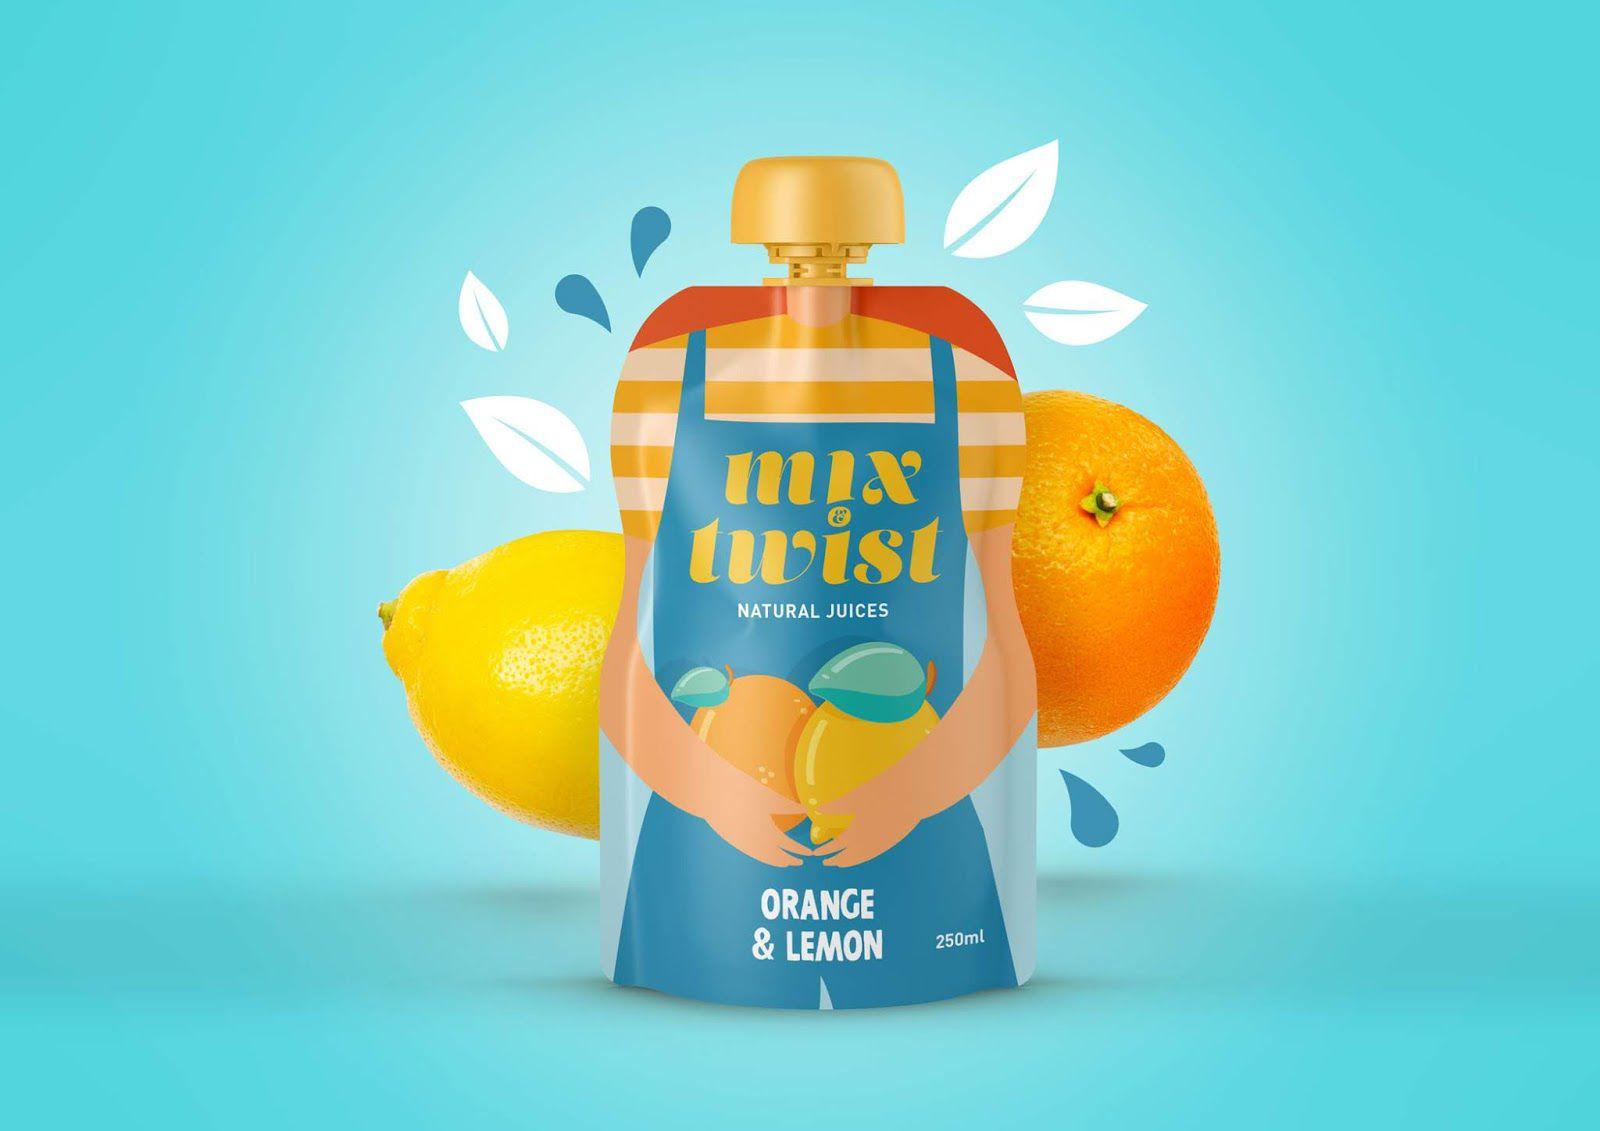 Mix & Twist (jus de fruits naturels sans additifs ni conservateurs) I Design : Mara Rodríguez - Design, Espagne (janvier 2020)